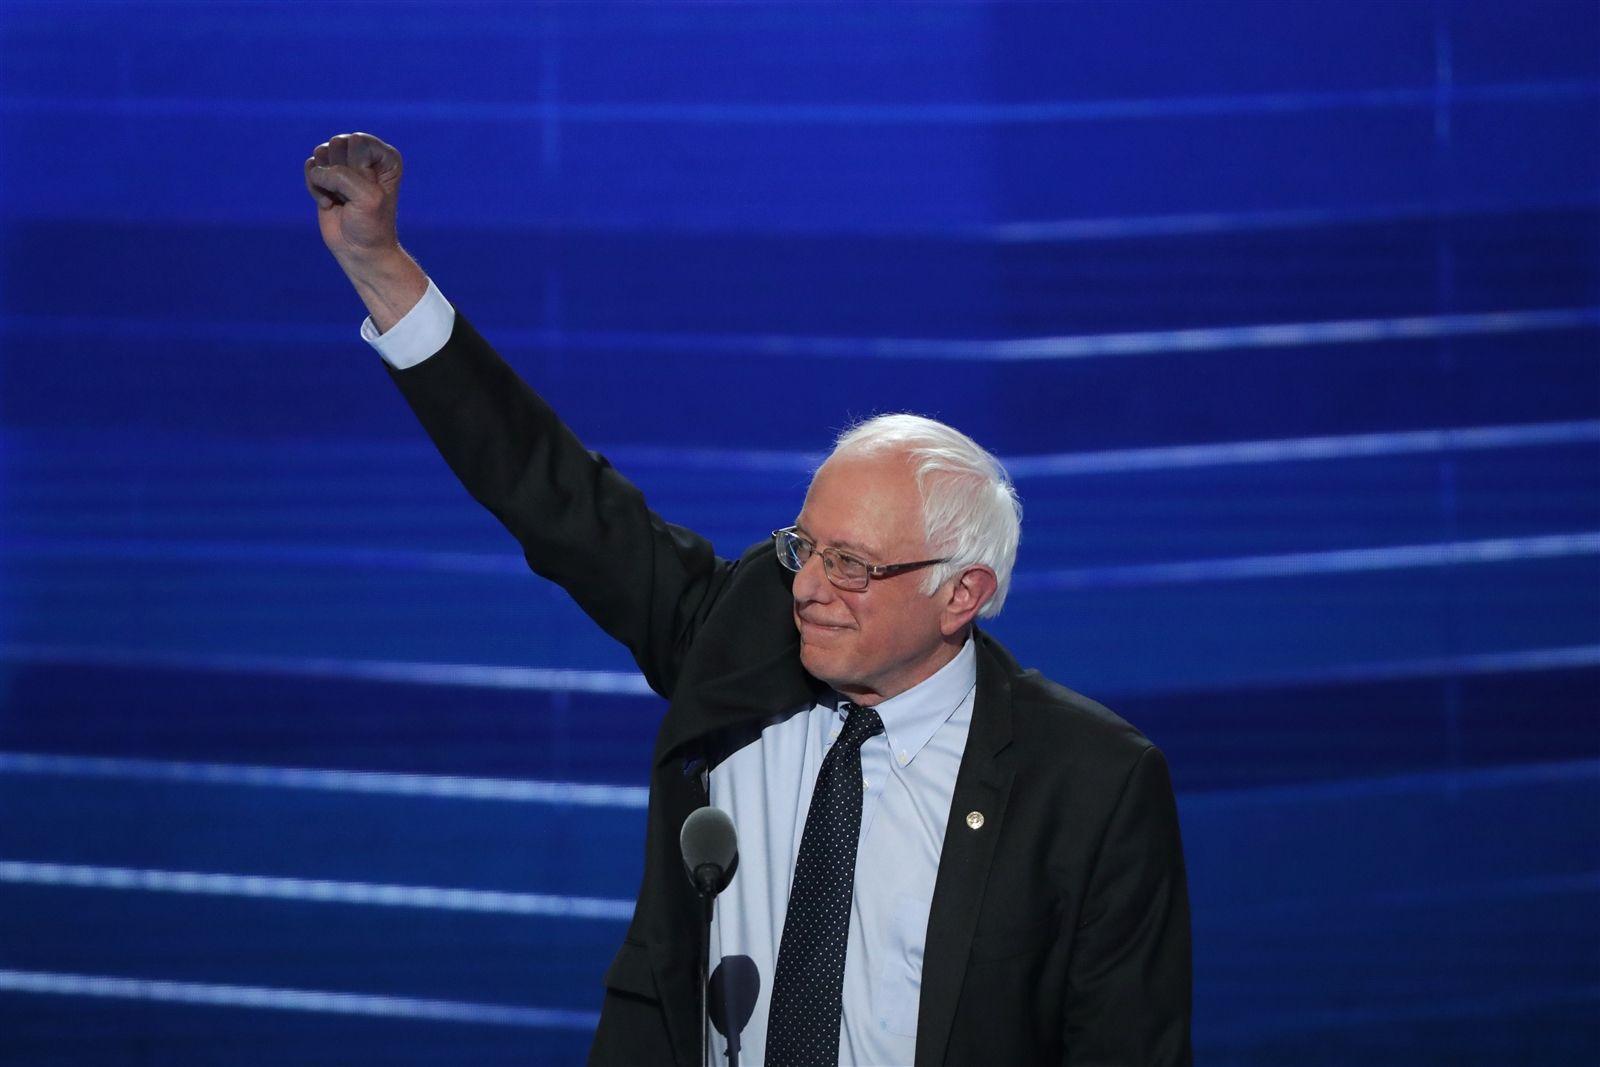 Sen. Bernie Sanders acknowledges the crowd before delivering remarks.